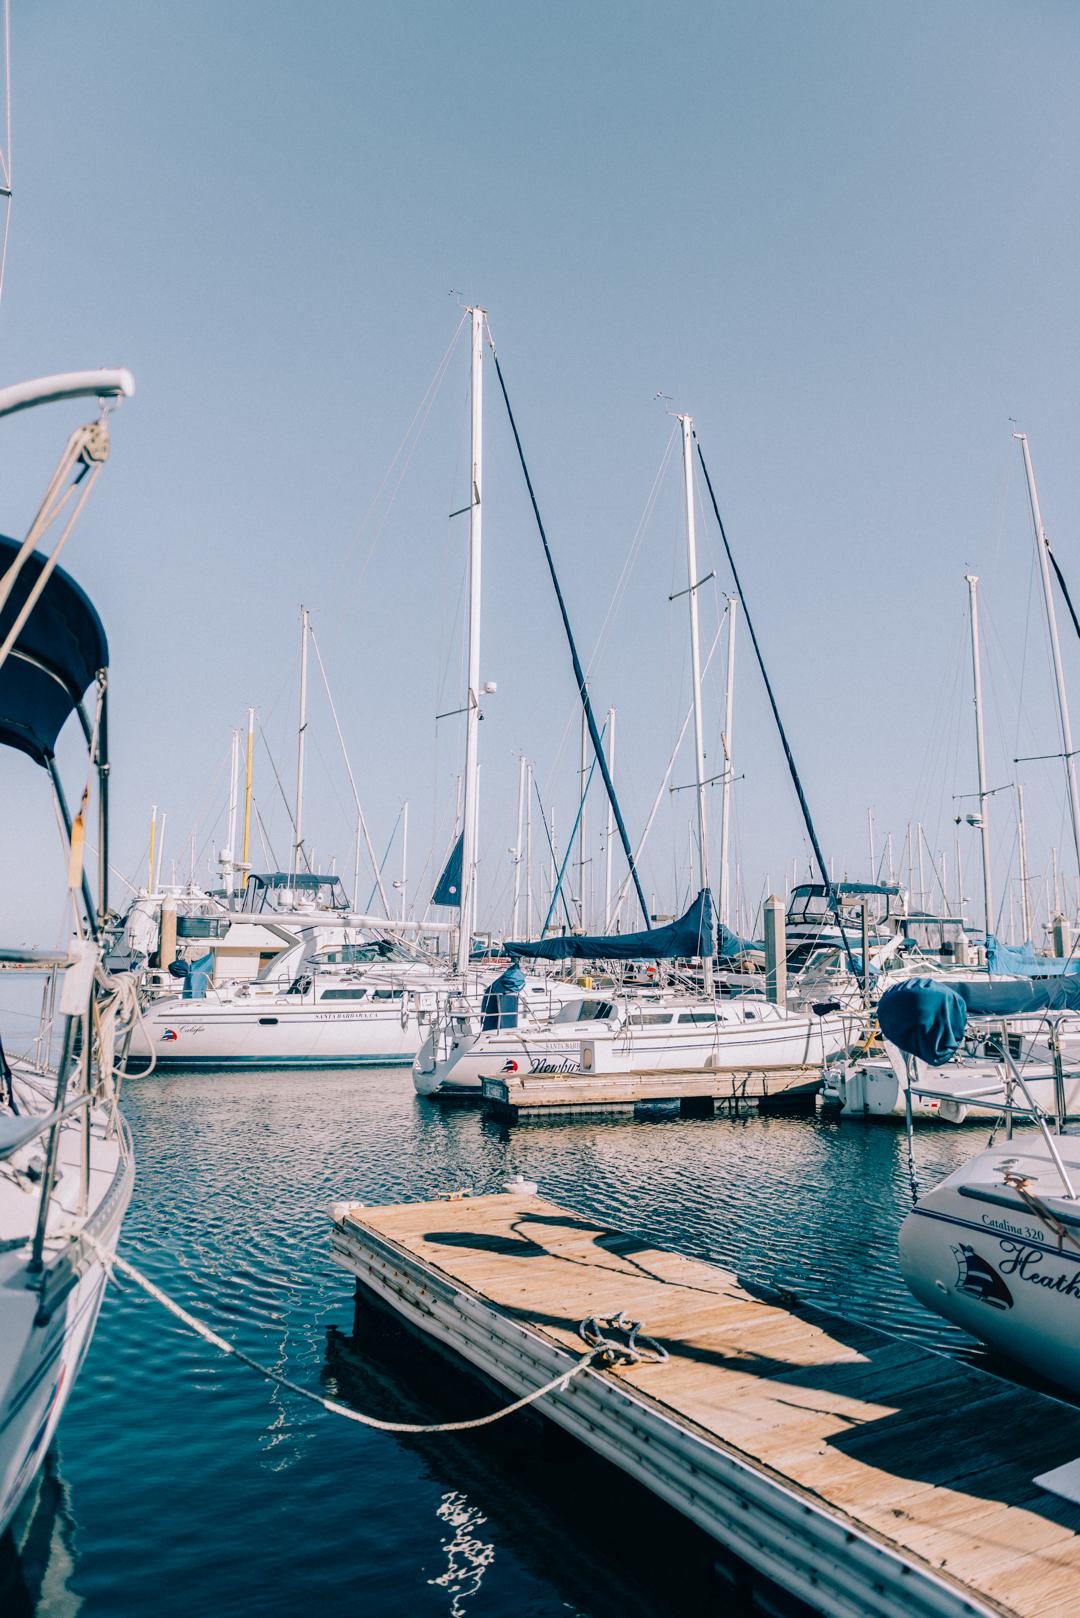 2. Go Whale Watching - Santa Barbara Sailing Center